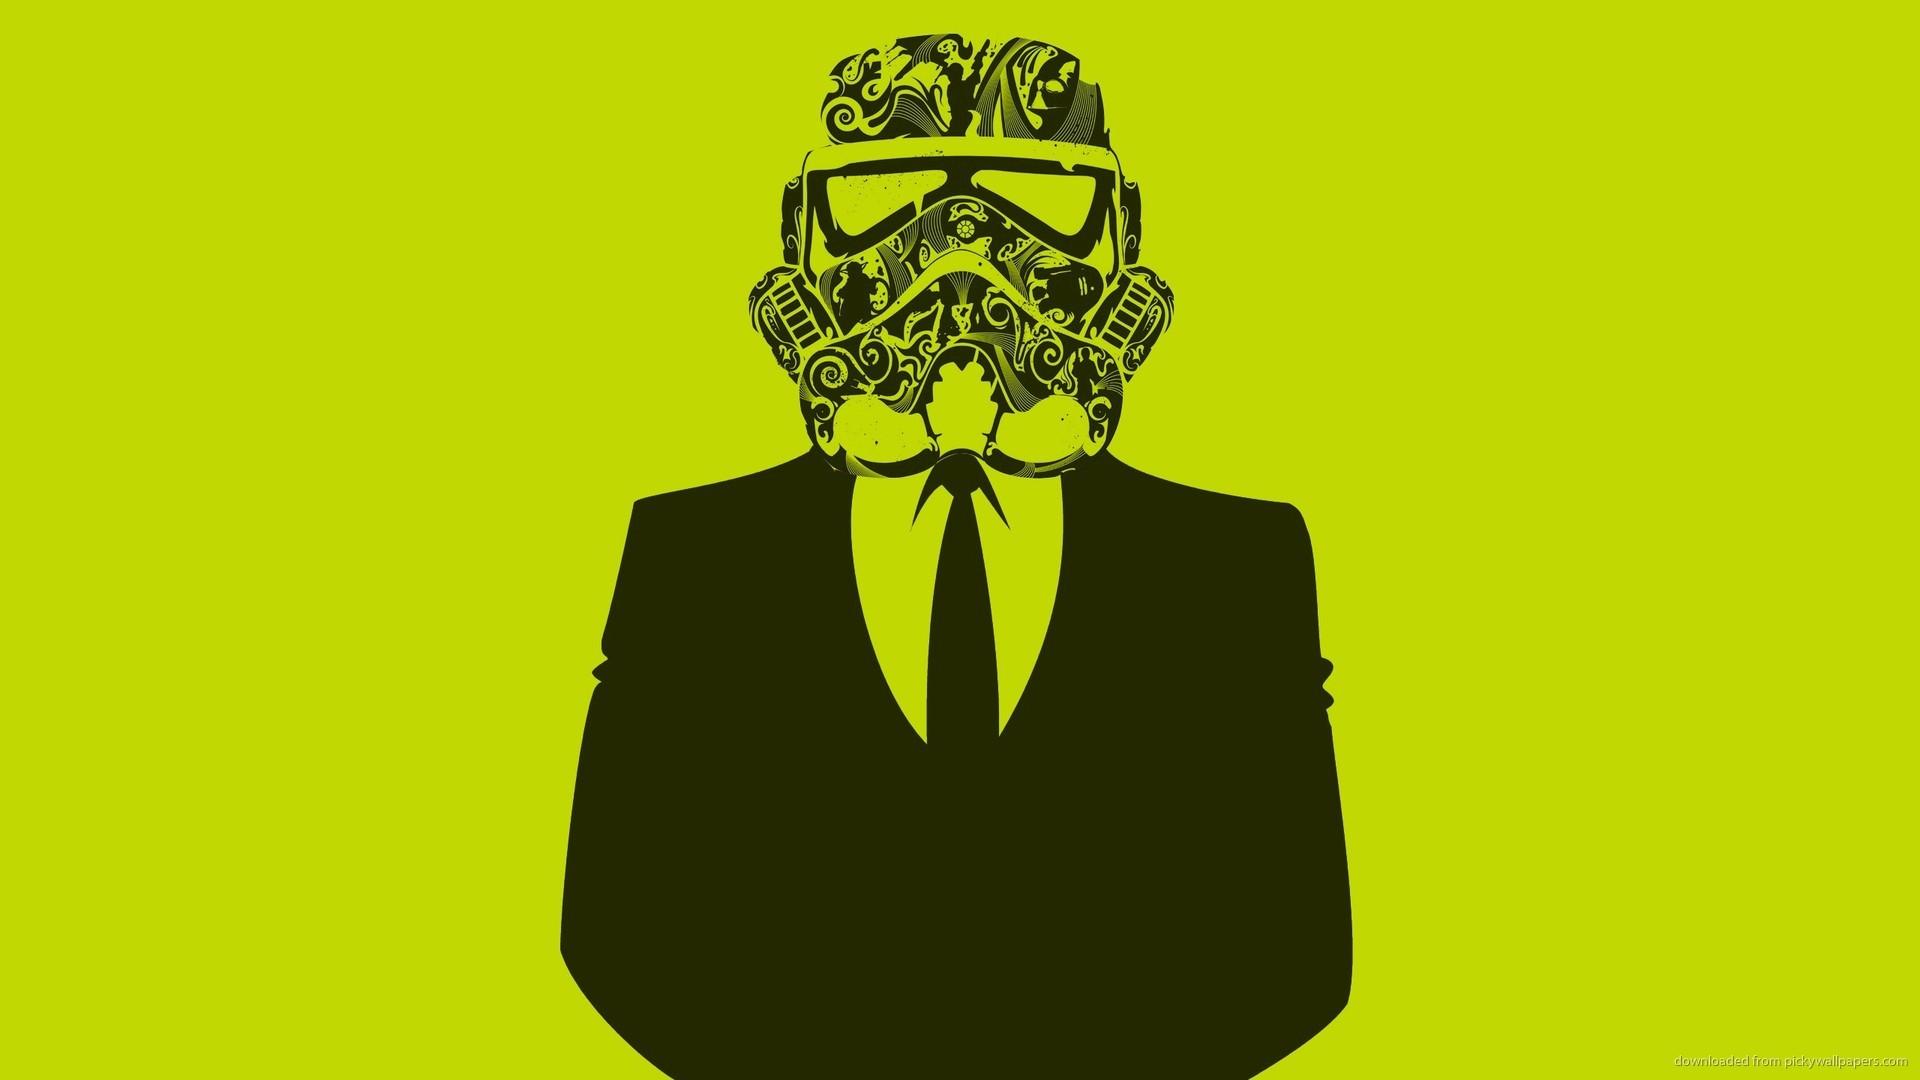 Suit wallpaper hd 65 images - Stormtrooper suit wallpaper ...